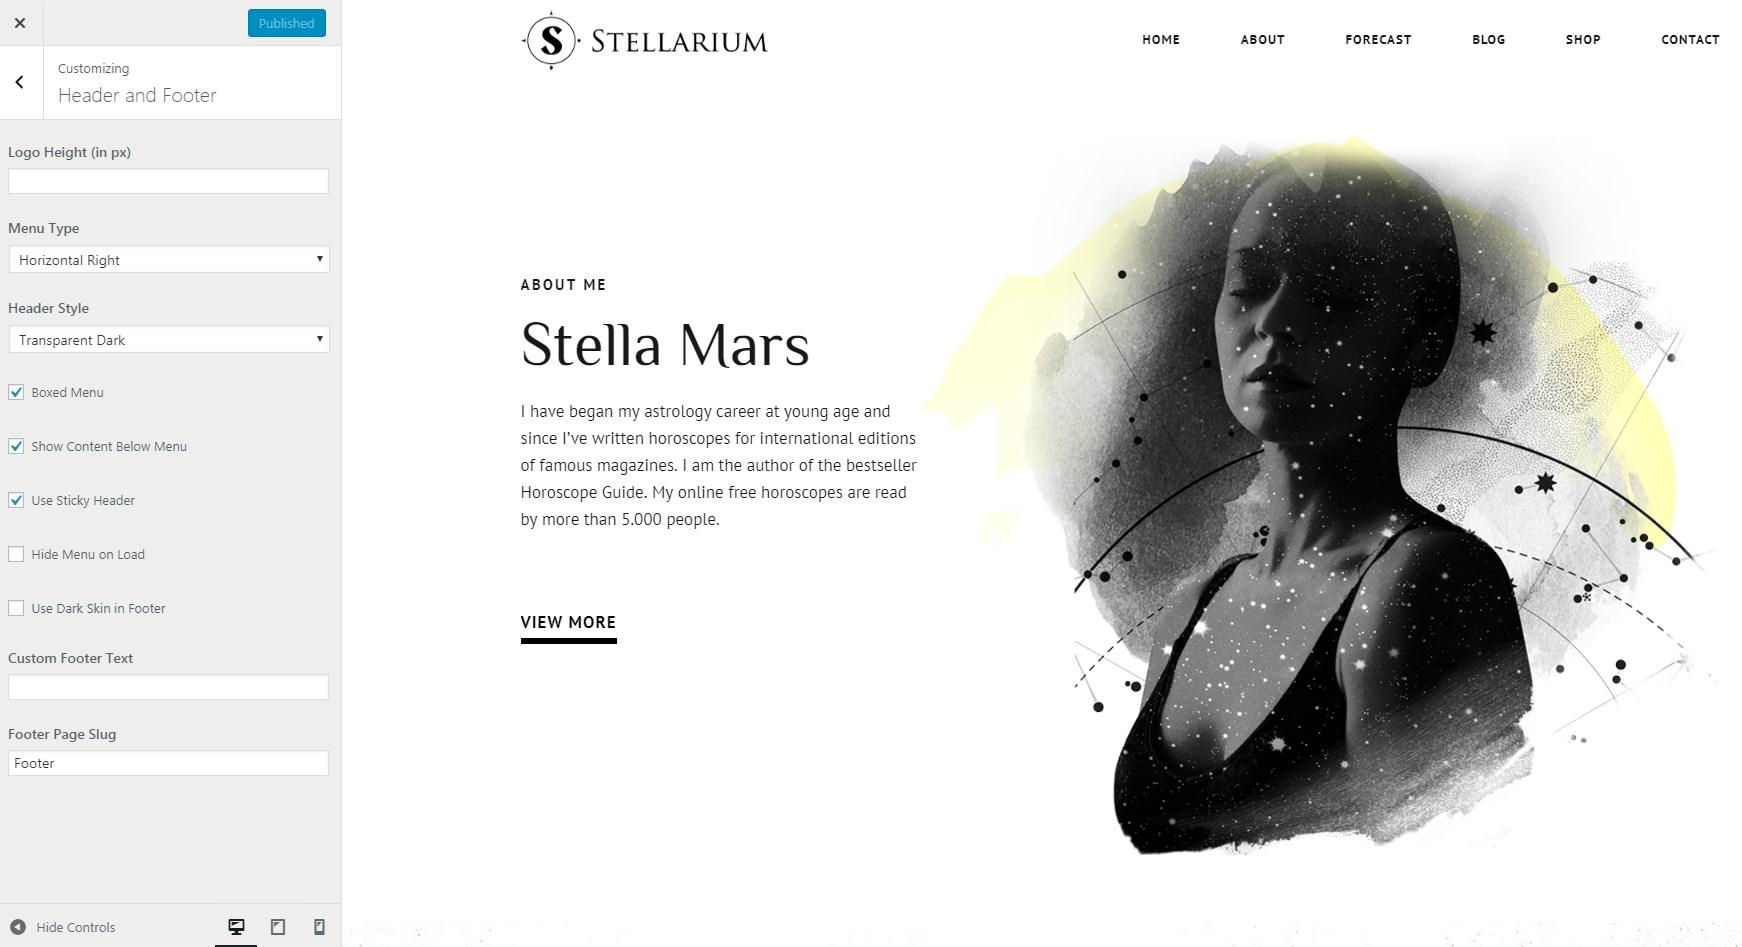 https://documentation.bold-themes.com/stellarium/wp-content/uploads/sites/34/2018/06/stellarium-customize-05.jpg